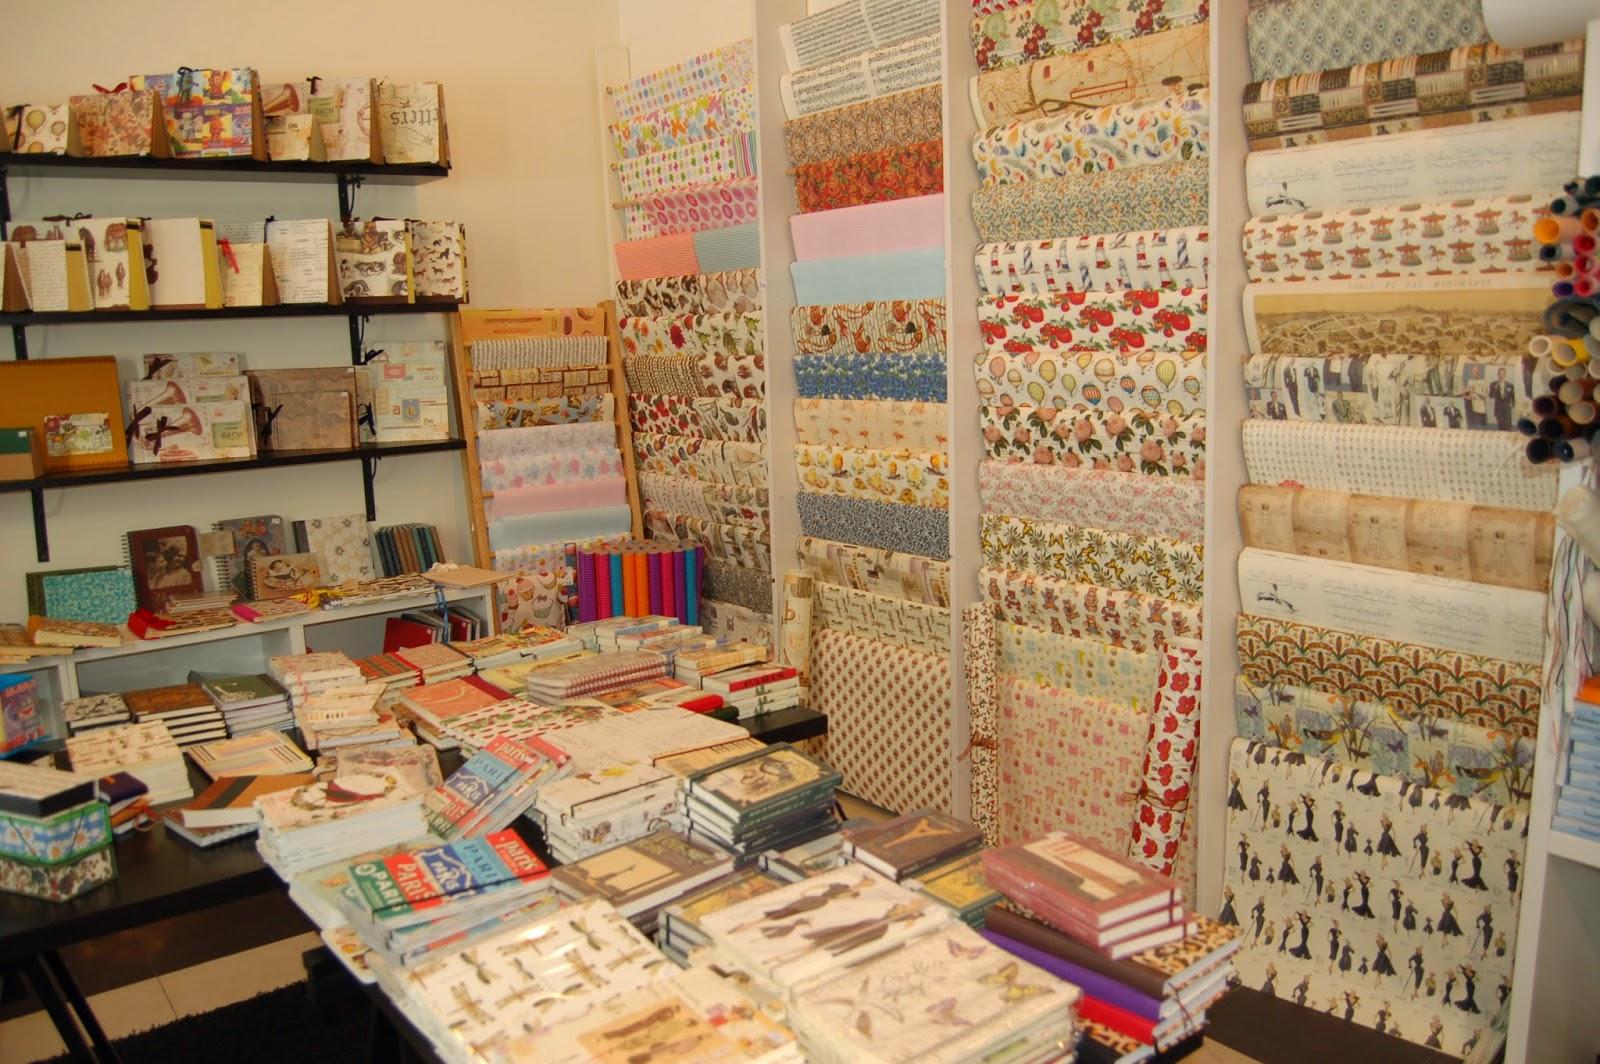 La vie est belle de tiendas por calle la merced 1 - Muebles de papel ...